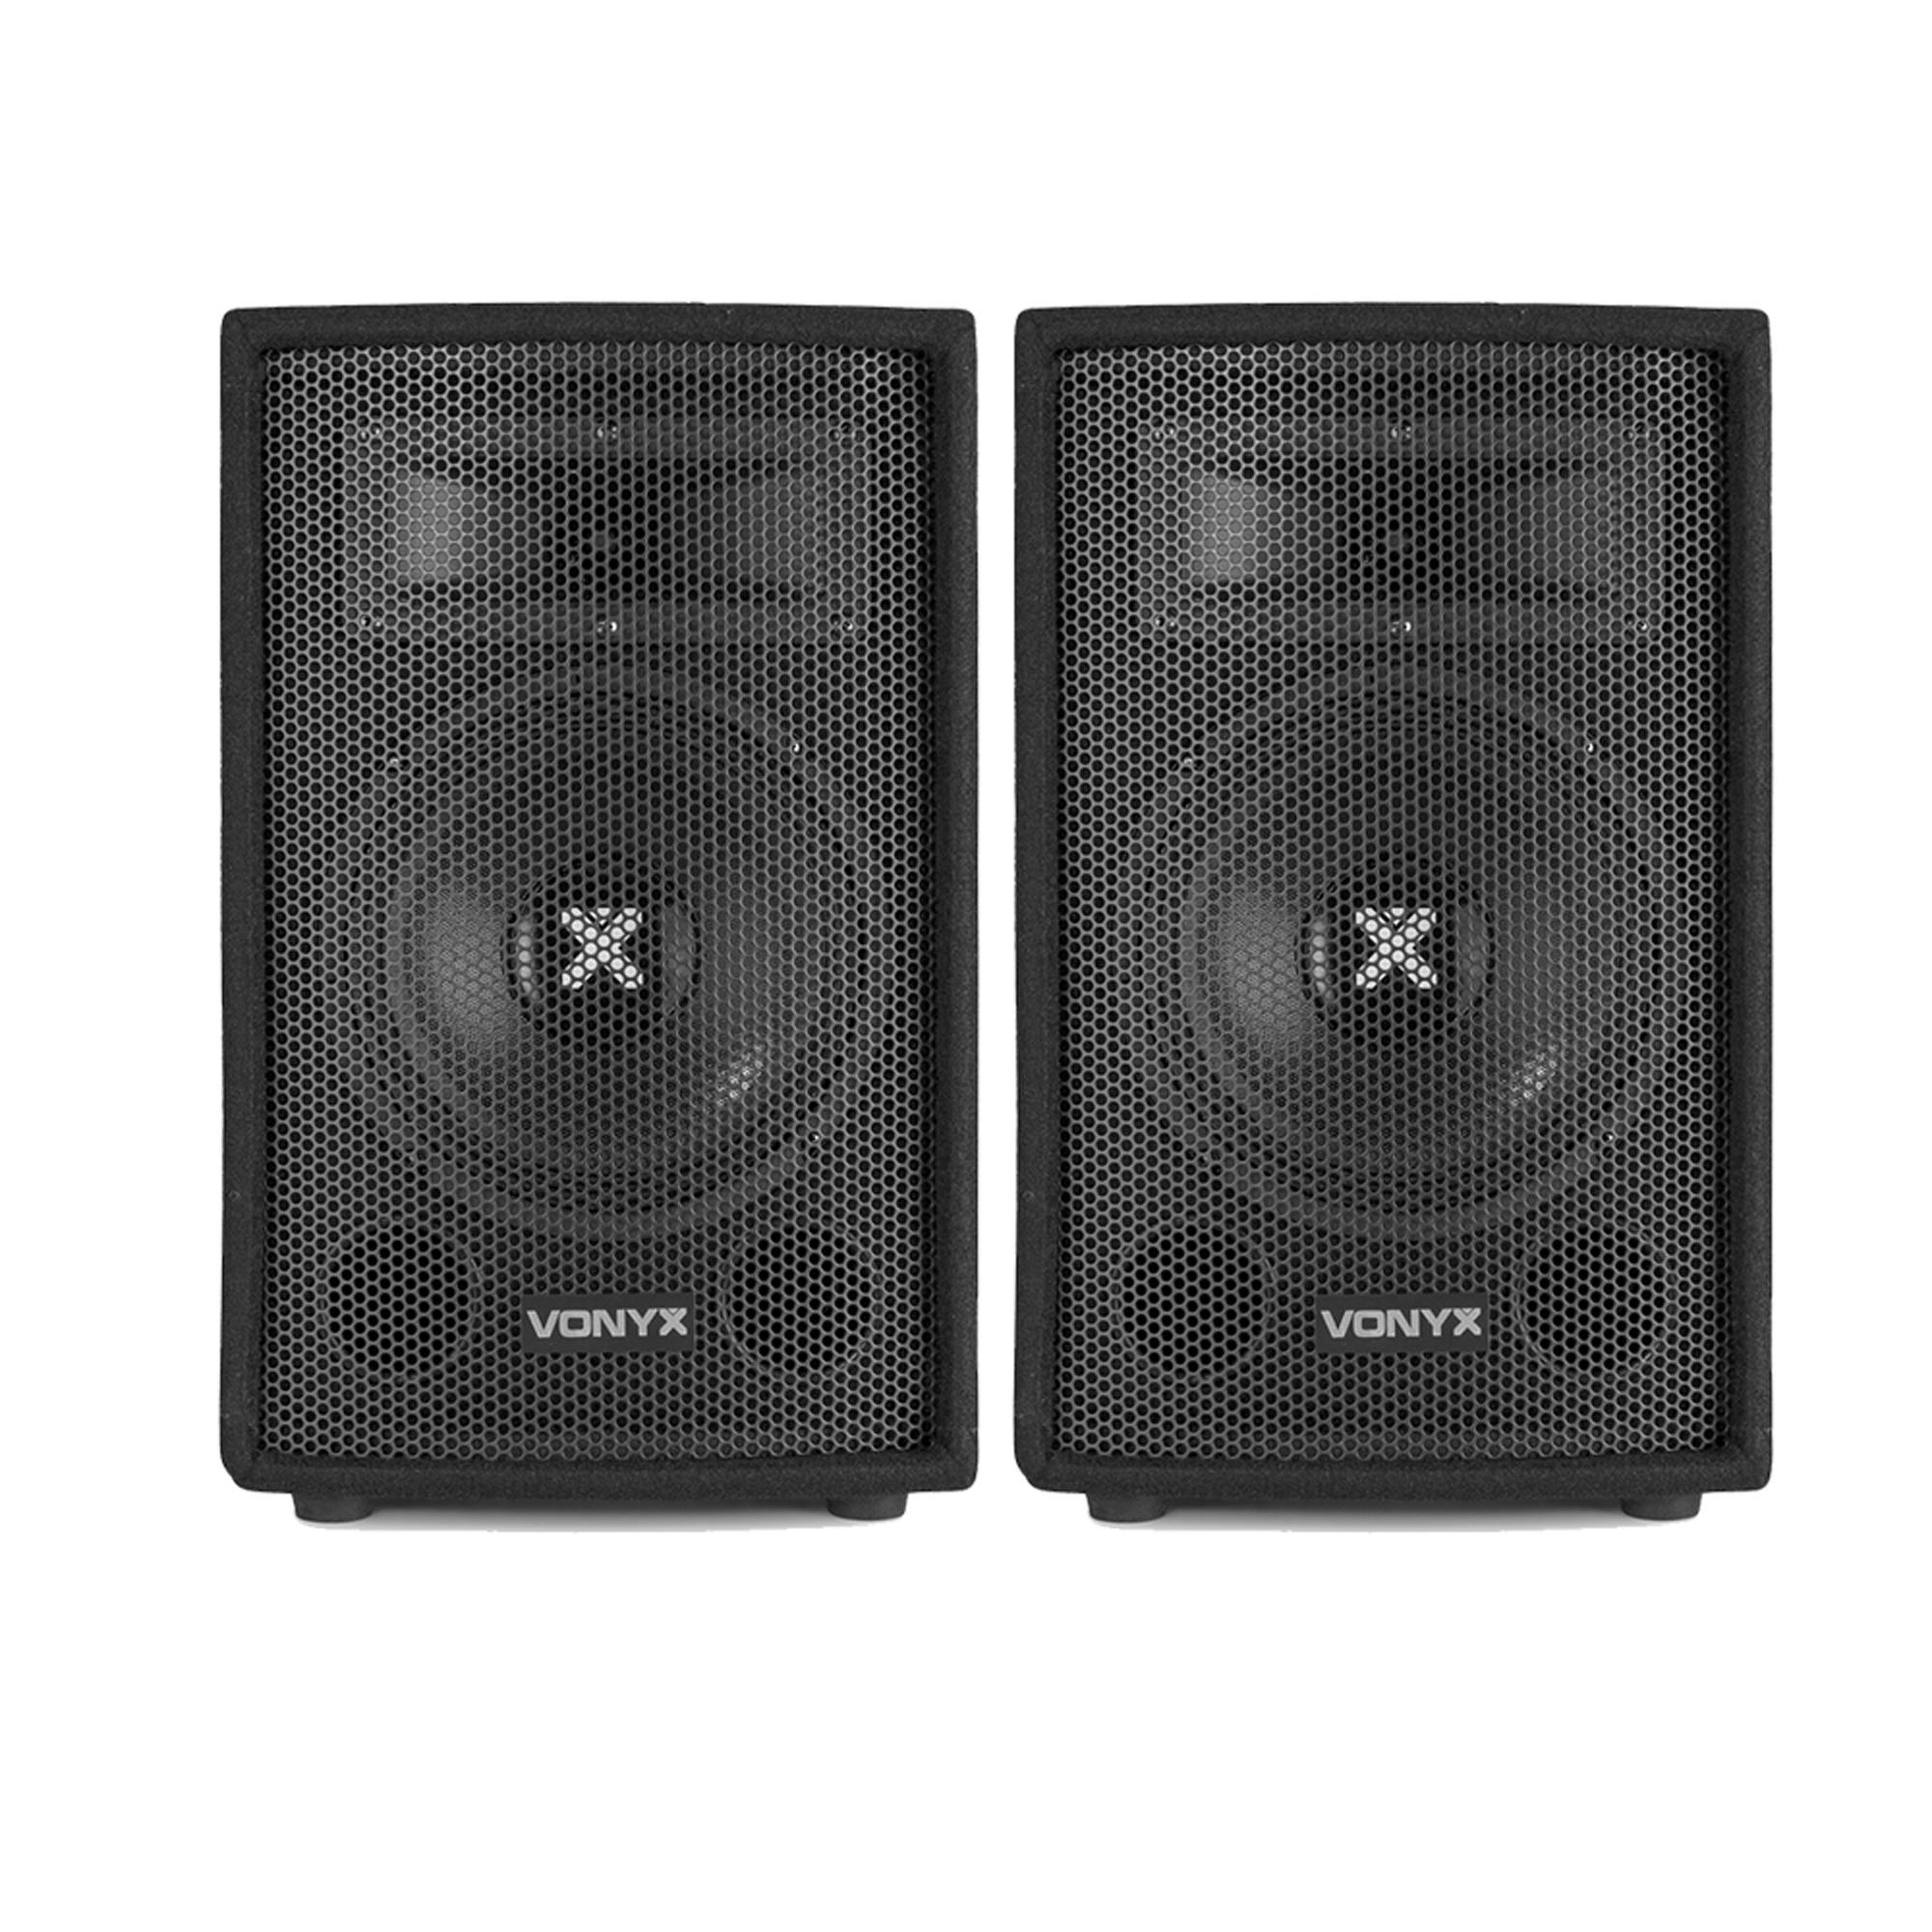 Strange Details About 2X Vonyx 8 Portable Passive Pa Dj Sound System Bedroom Speakers 400W Ssc2166 Download Free Architecture Designs Rallybritishbridgeorg